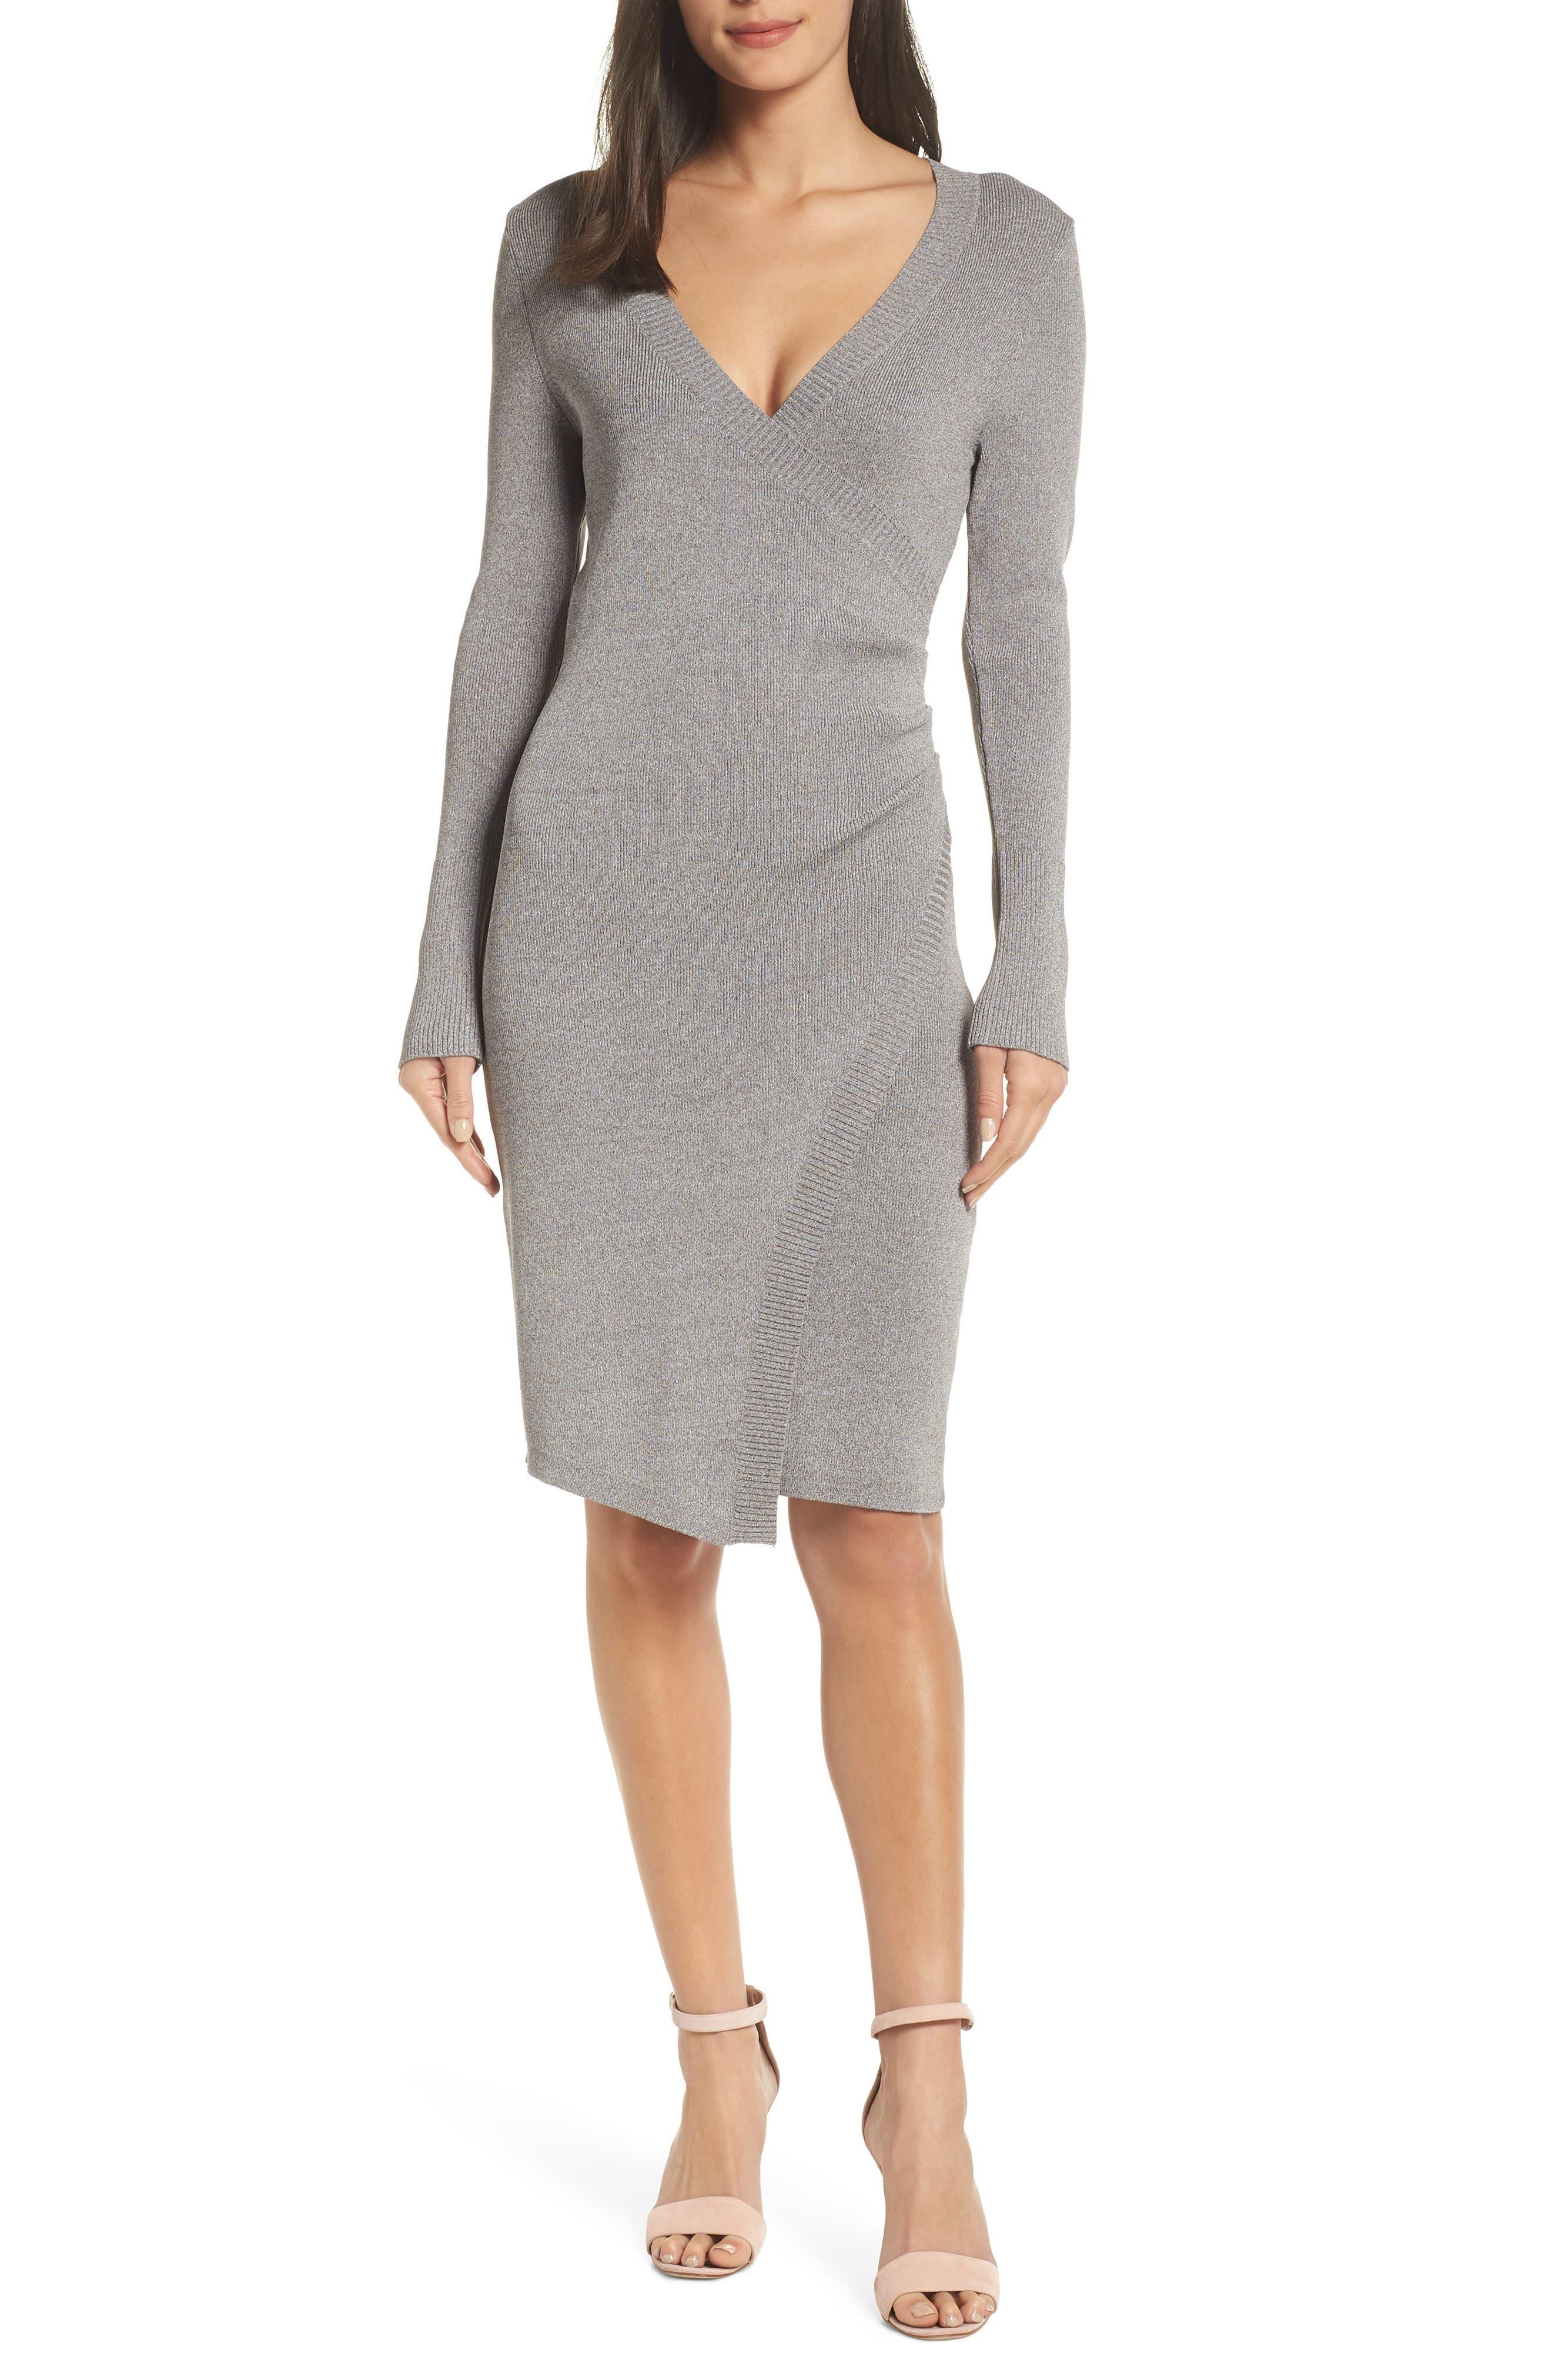 ADELYN RAE Sharine Sweater Dress in Heather Grey